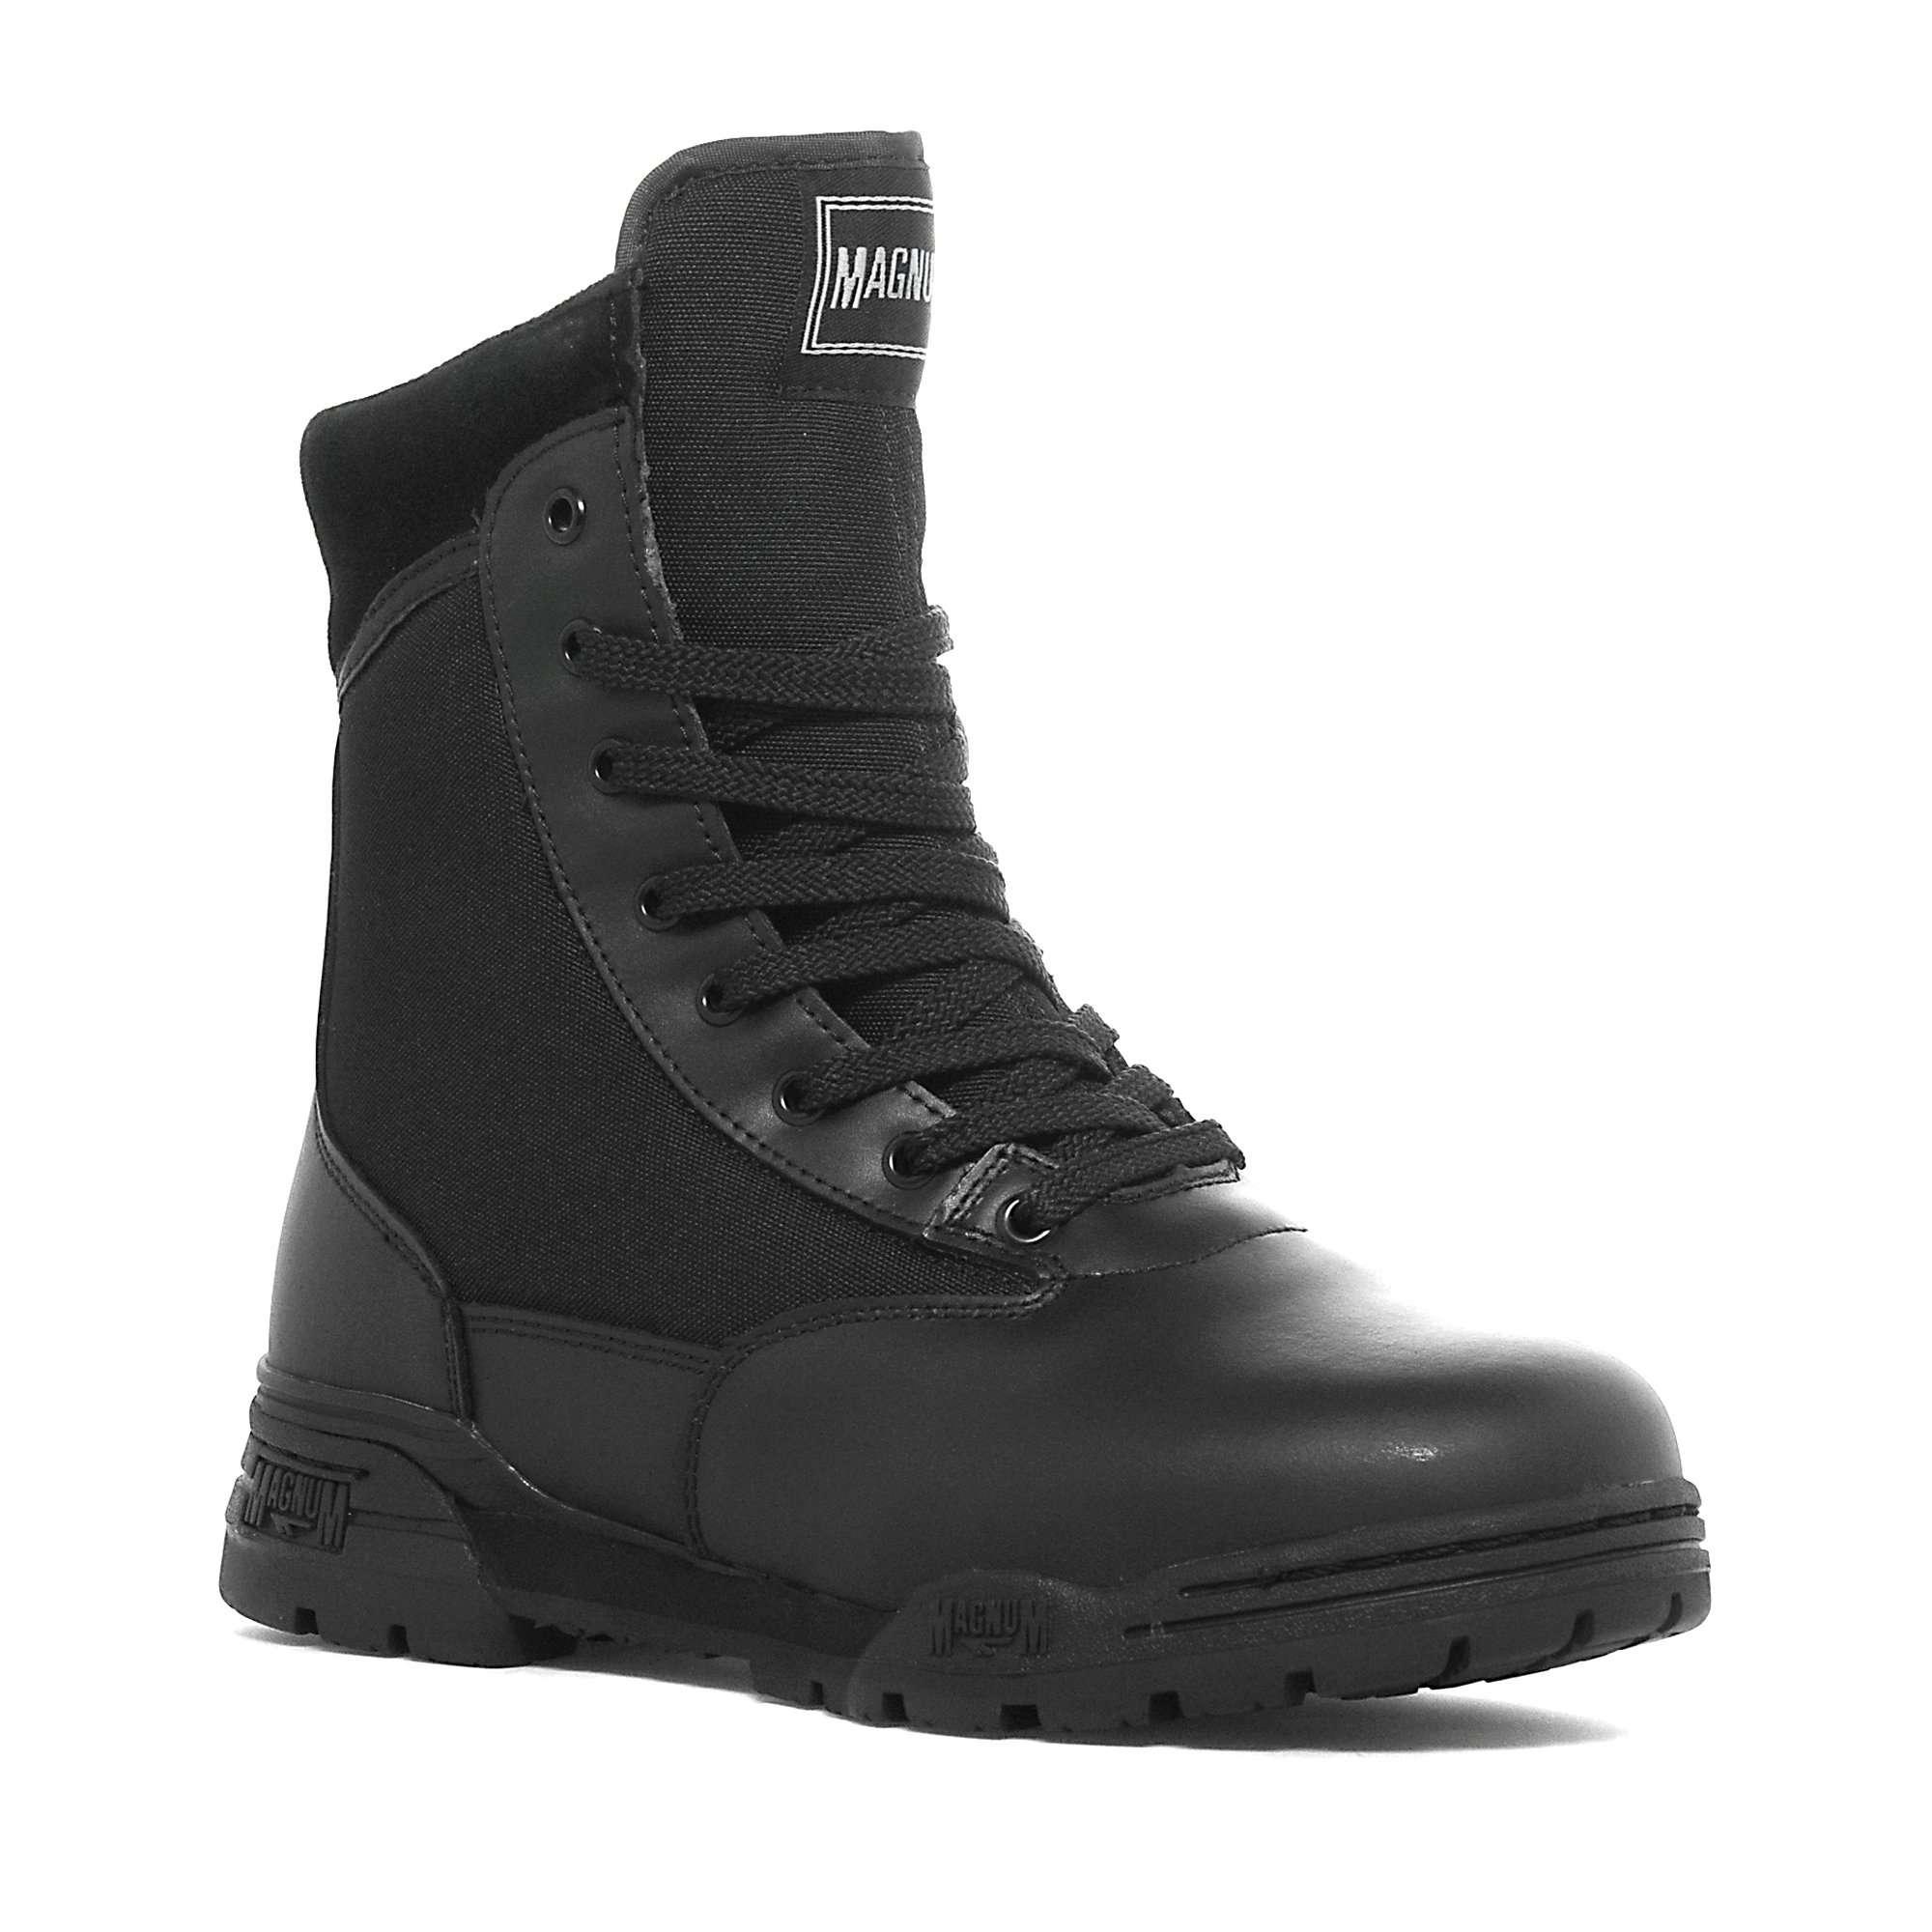 MAGNUM Men's Classic Industrial Work Boots